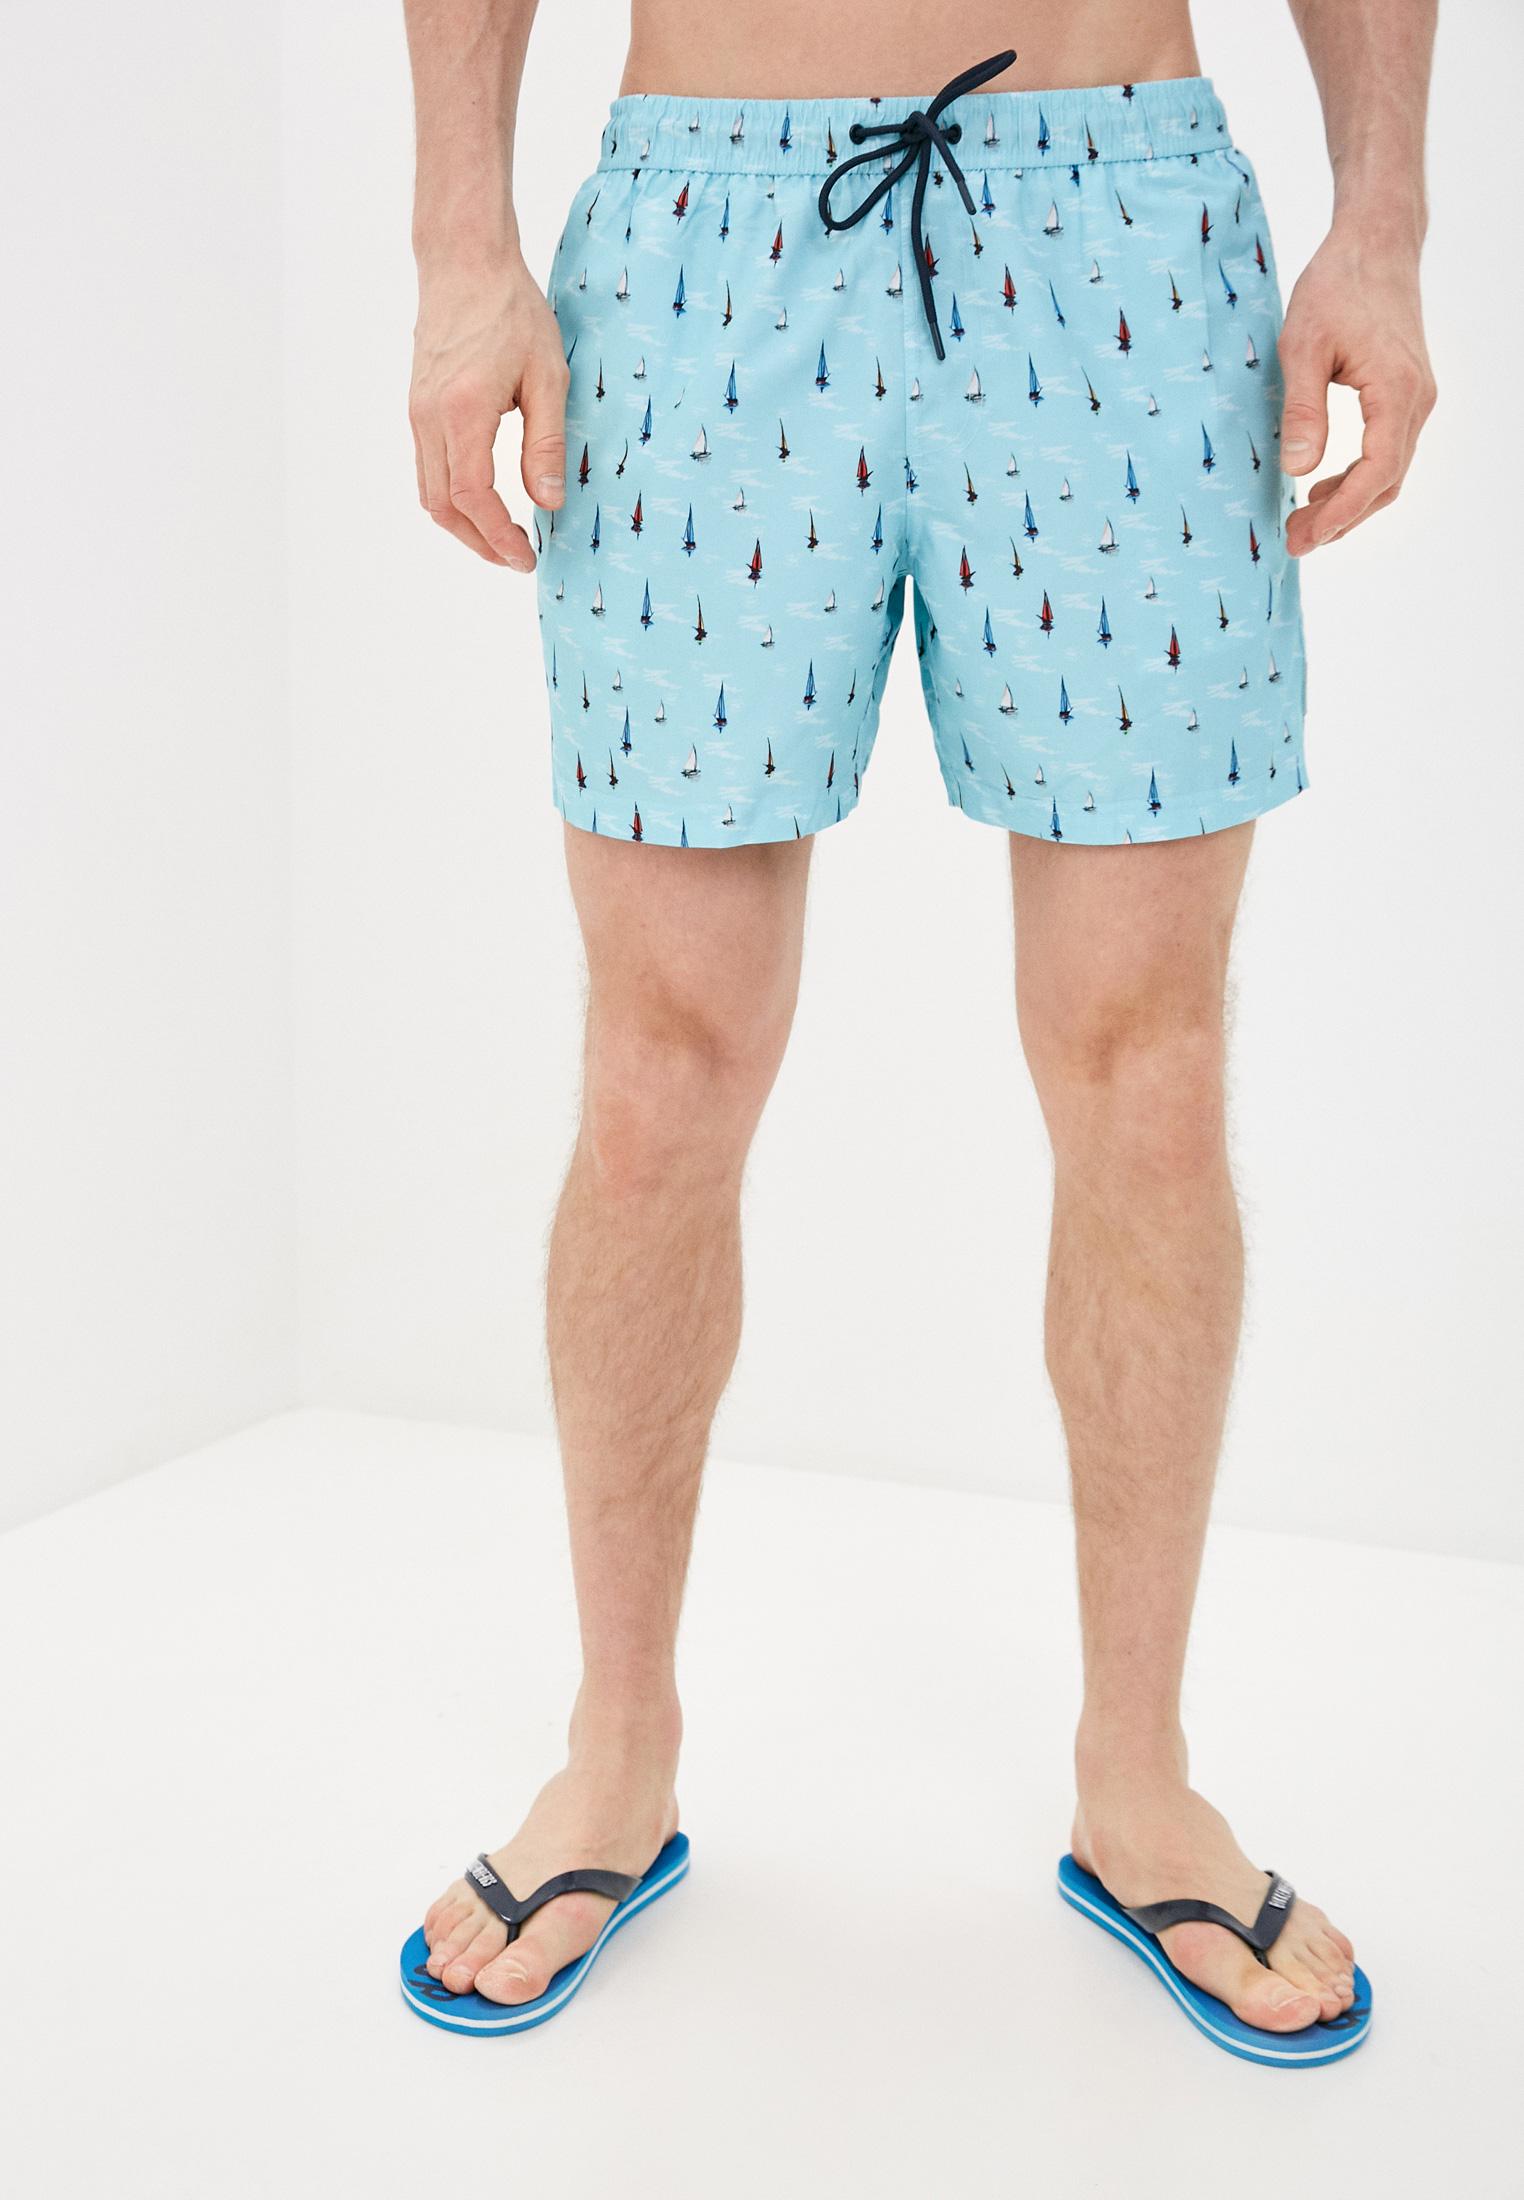 Мужские шорты для плавания SPRINGFIELD 599301